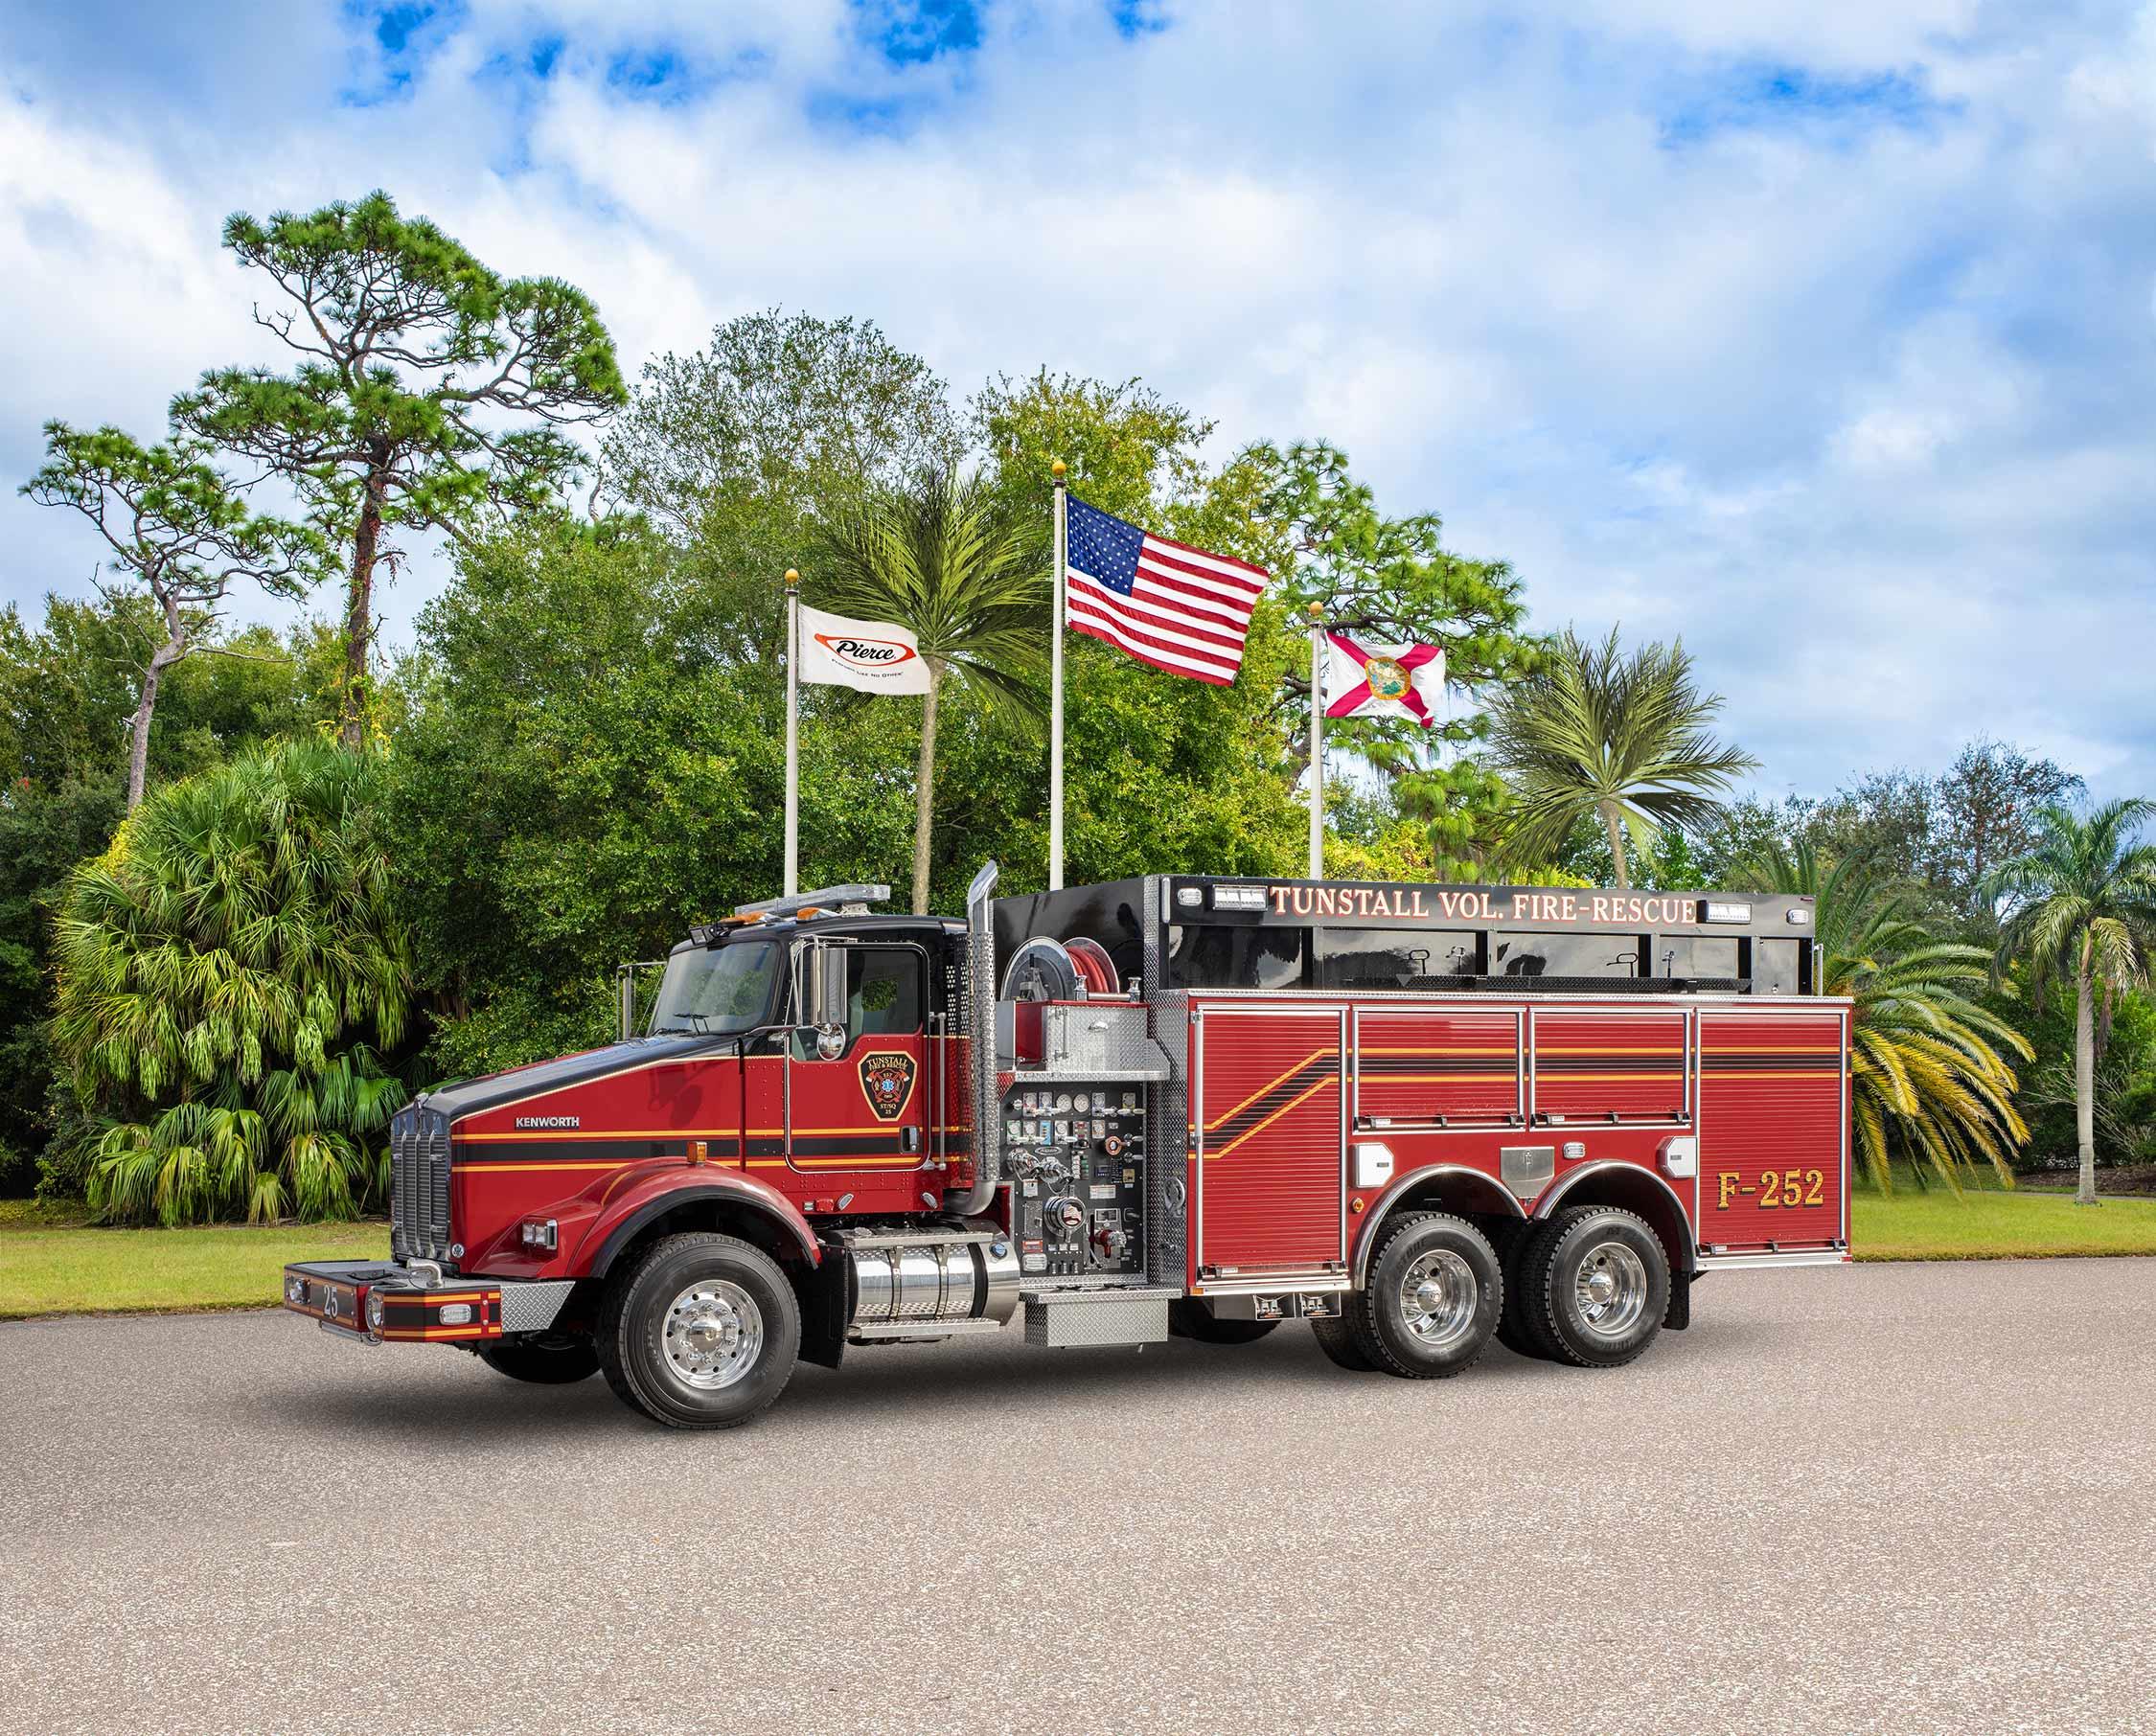 Tunstall Volunteer Fire Department - Tanker